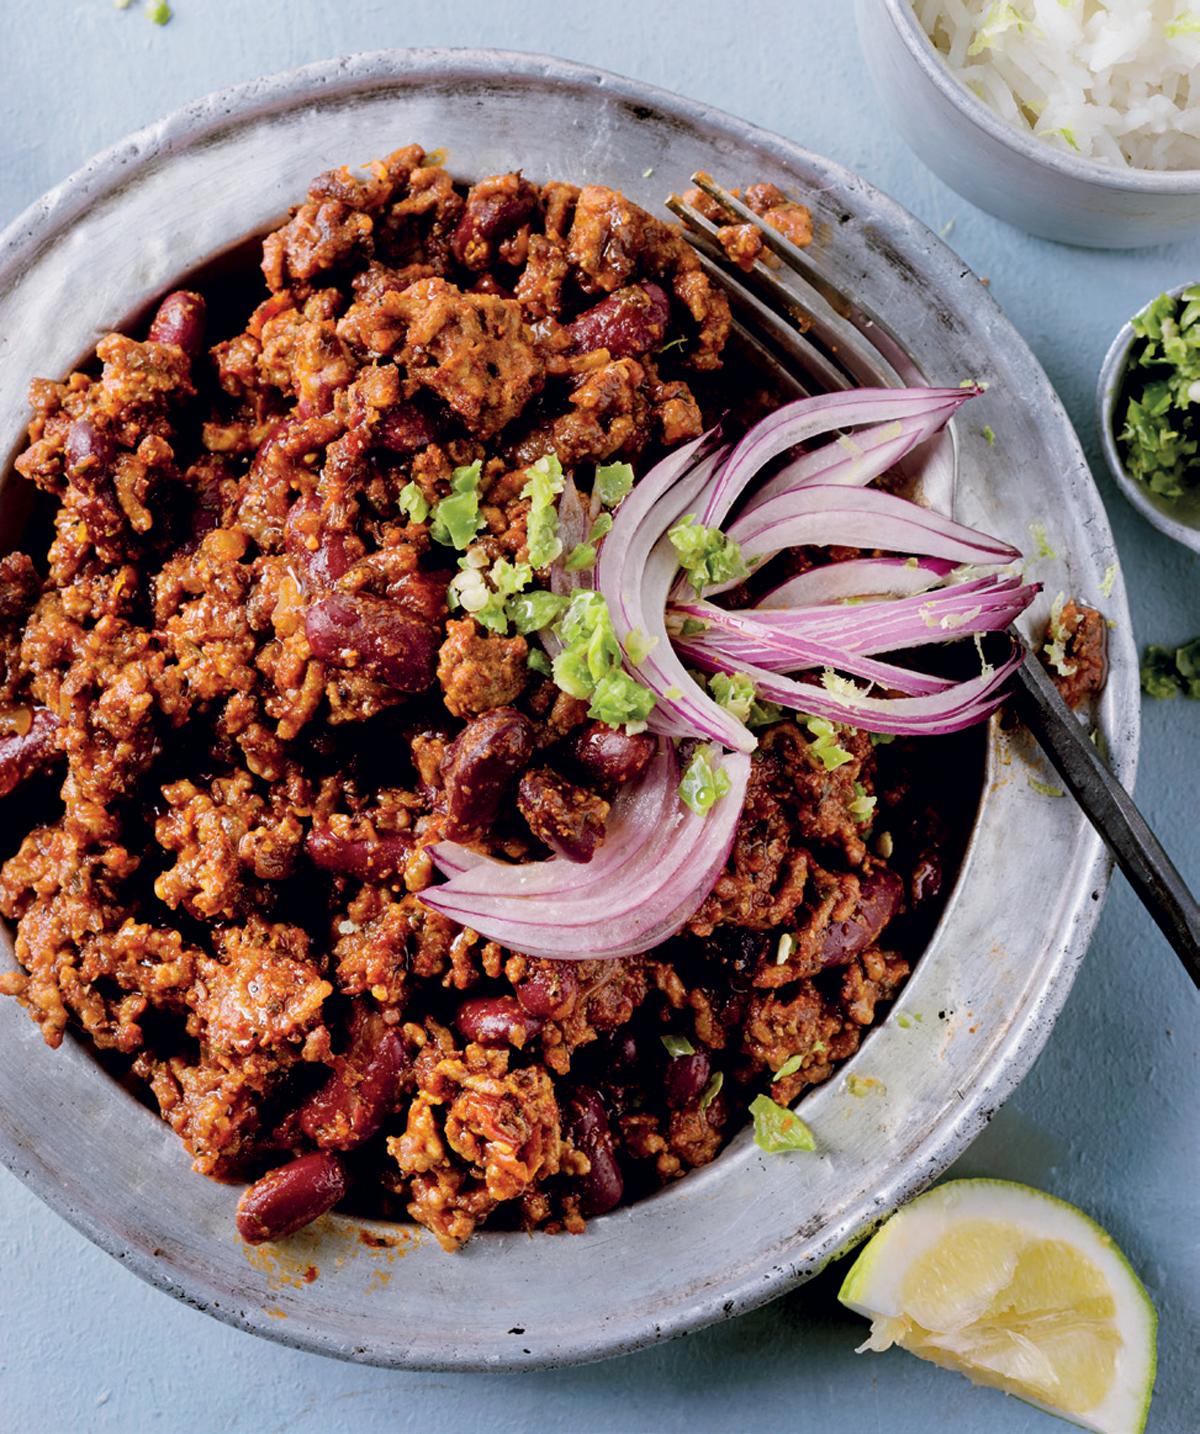 Easy Chilli Con Carne Recipe 30 Minutes Or Less